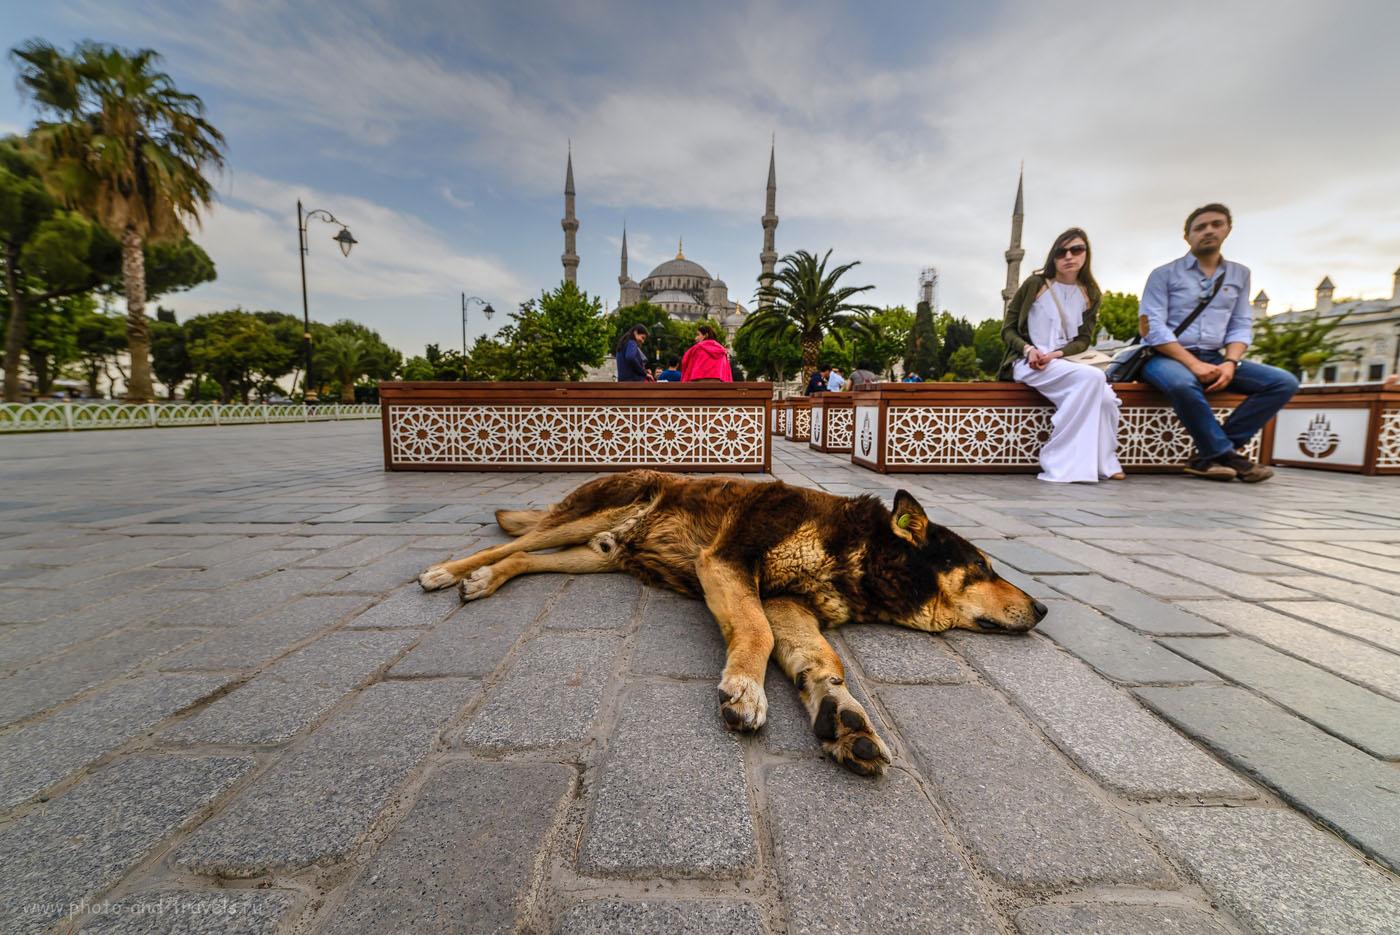 Фото 10. Собака на площади Султанахмет на фоне Голубой мечети. Обратите внимание: дворняга чипирована. Путешествие по Турции самостоятельно. Объектив Samyang 14mm f/2.8. Настройки: 1/160, 8.0, 200, 14, тонмаппинг.